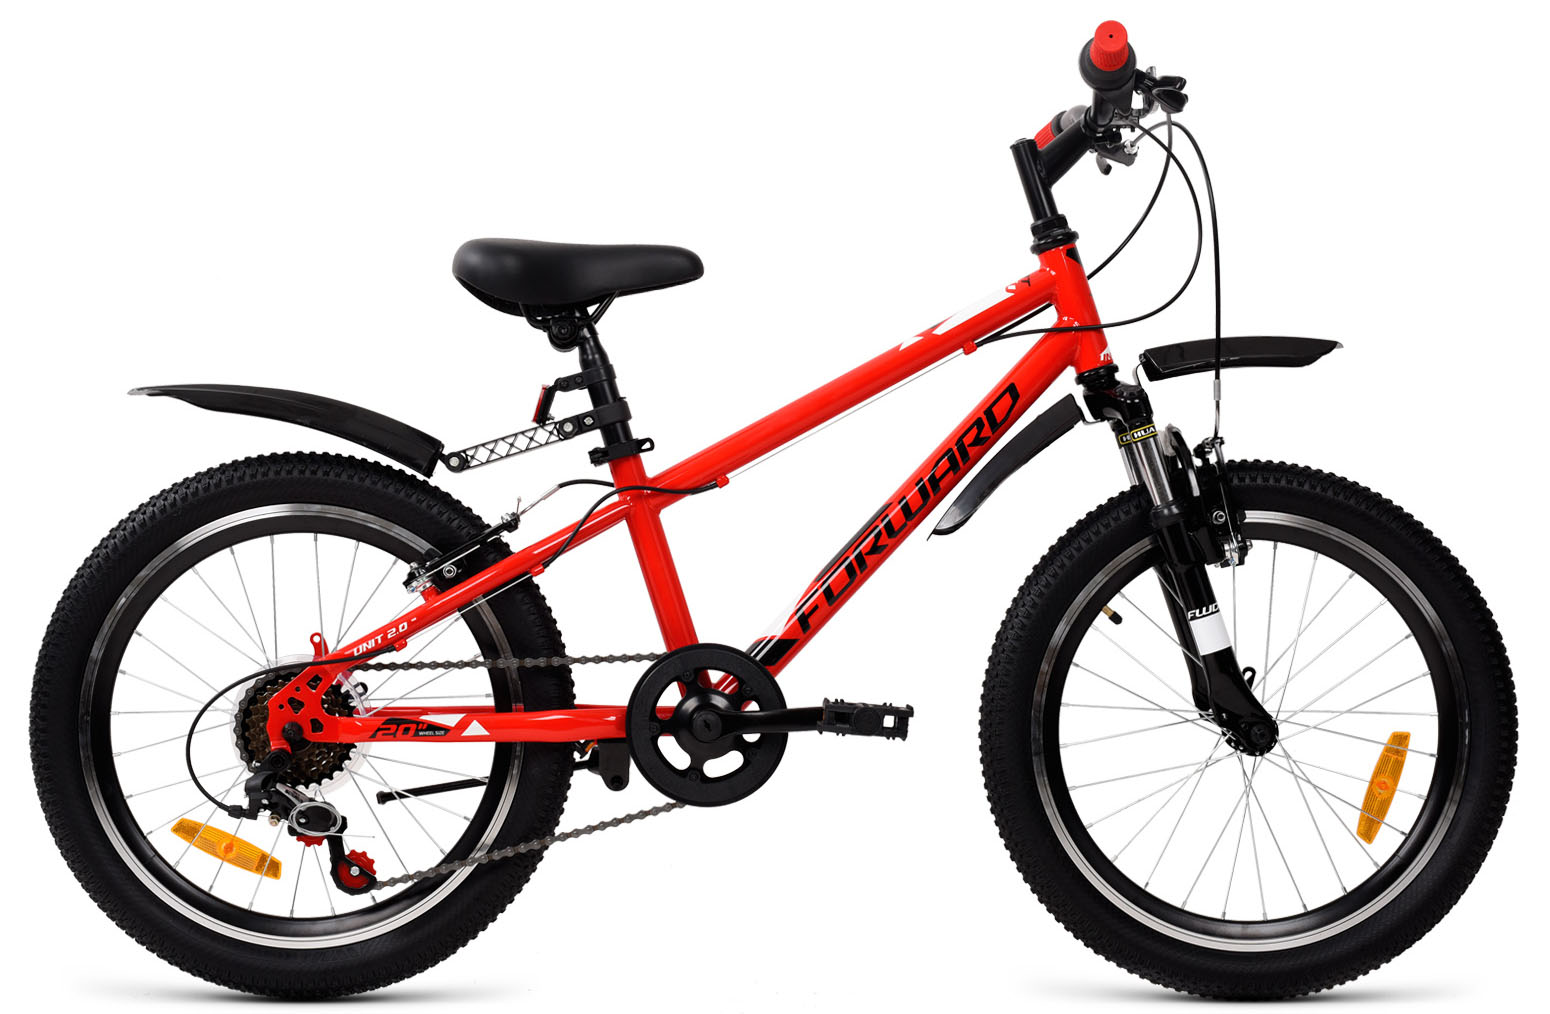 Велосипед Forward Unit 20 2.0 2019 велосипед forward rivera 1 0 2018